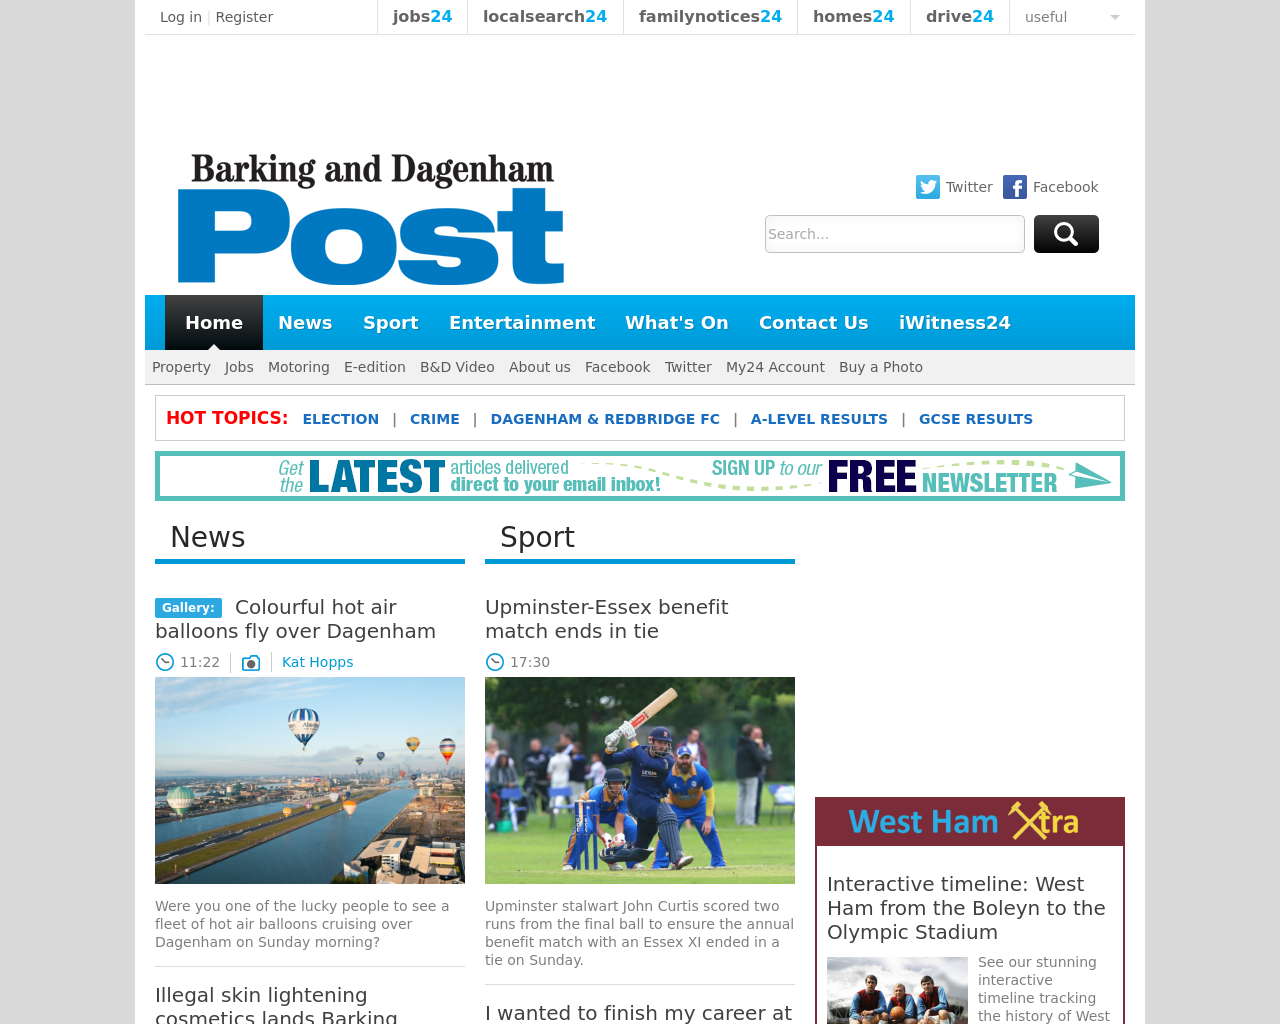 Barking-and-Dagenham-Post-Advertising-Reviews-Pricing